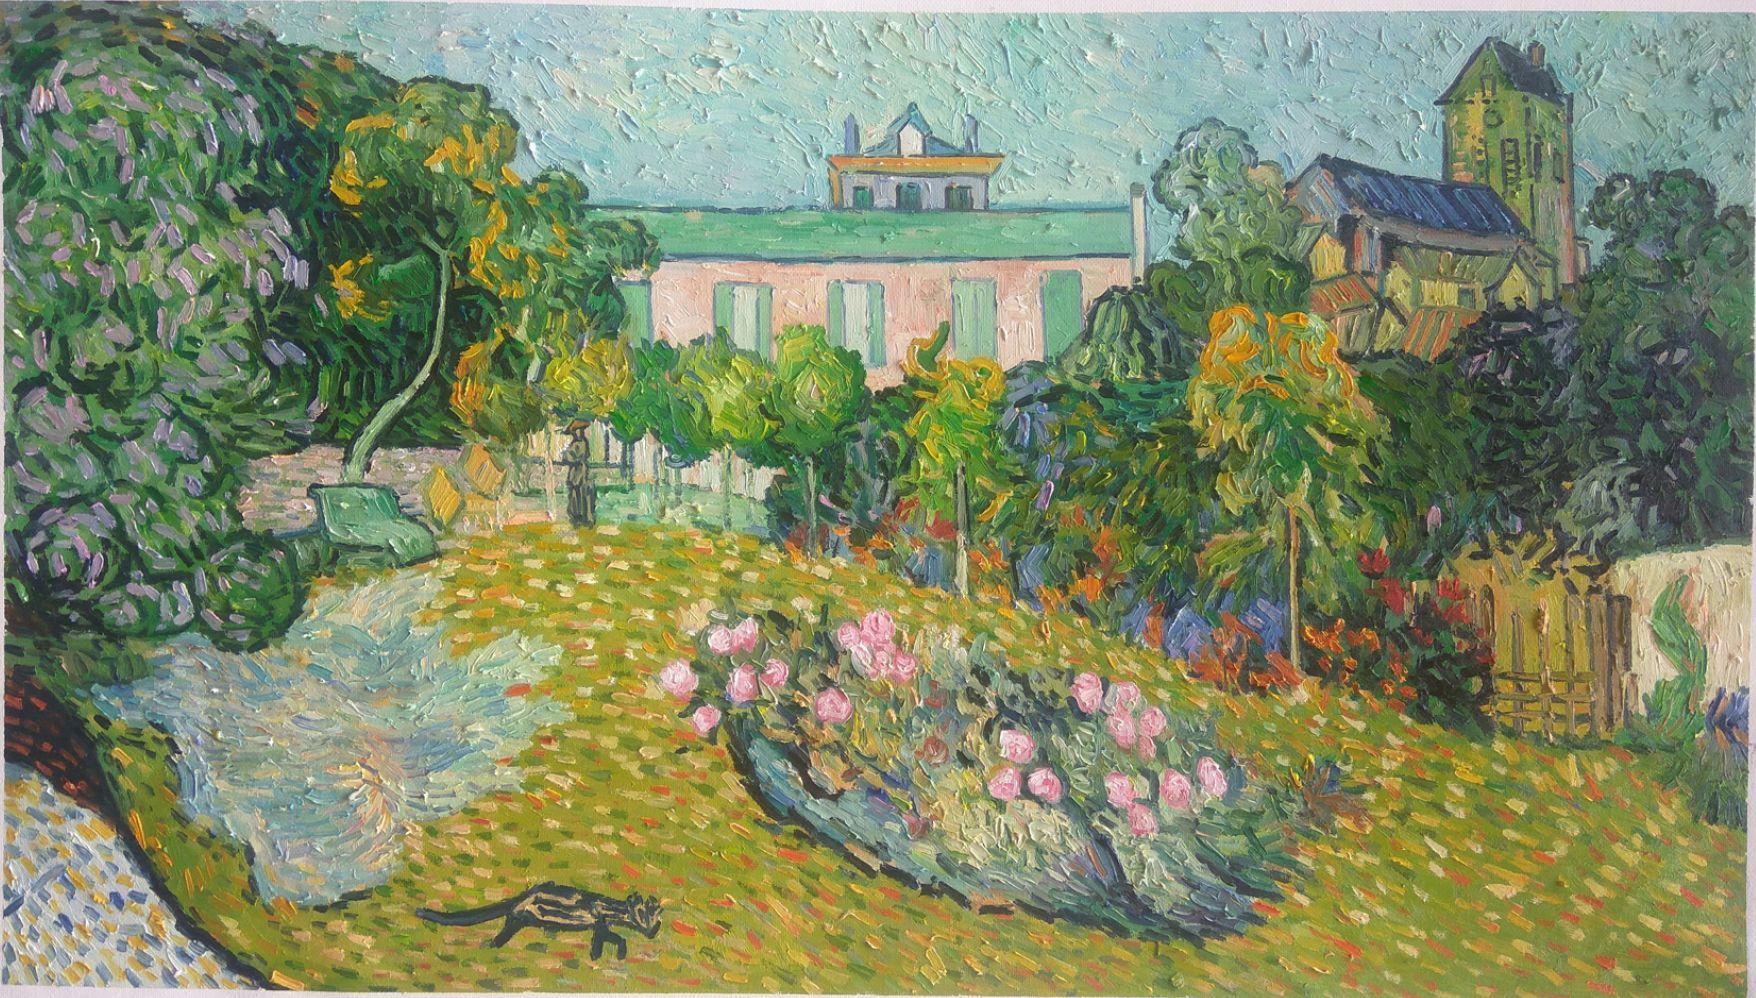 Daubignys Garden Van Gogh reproduction